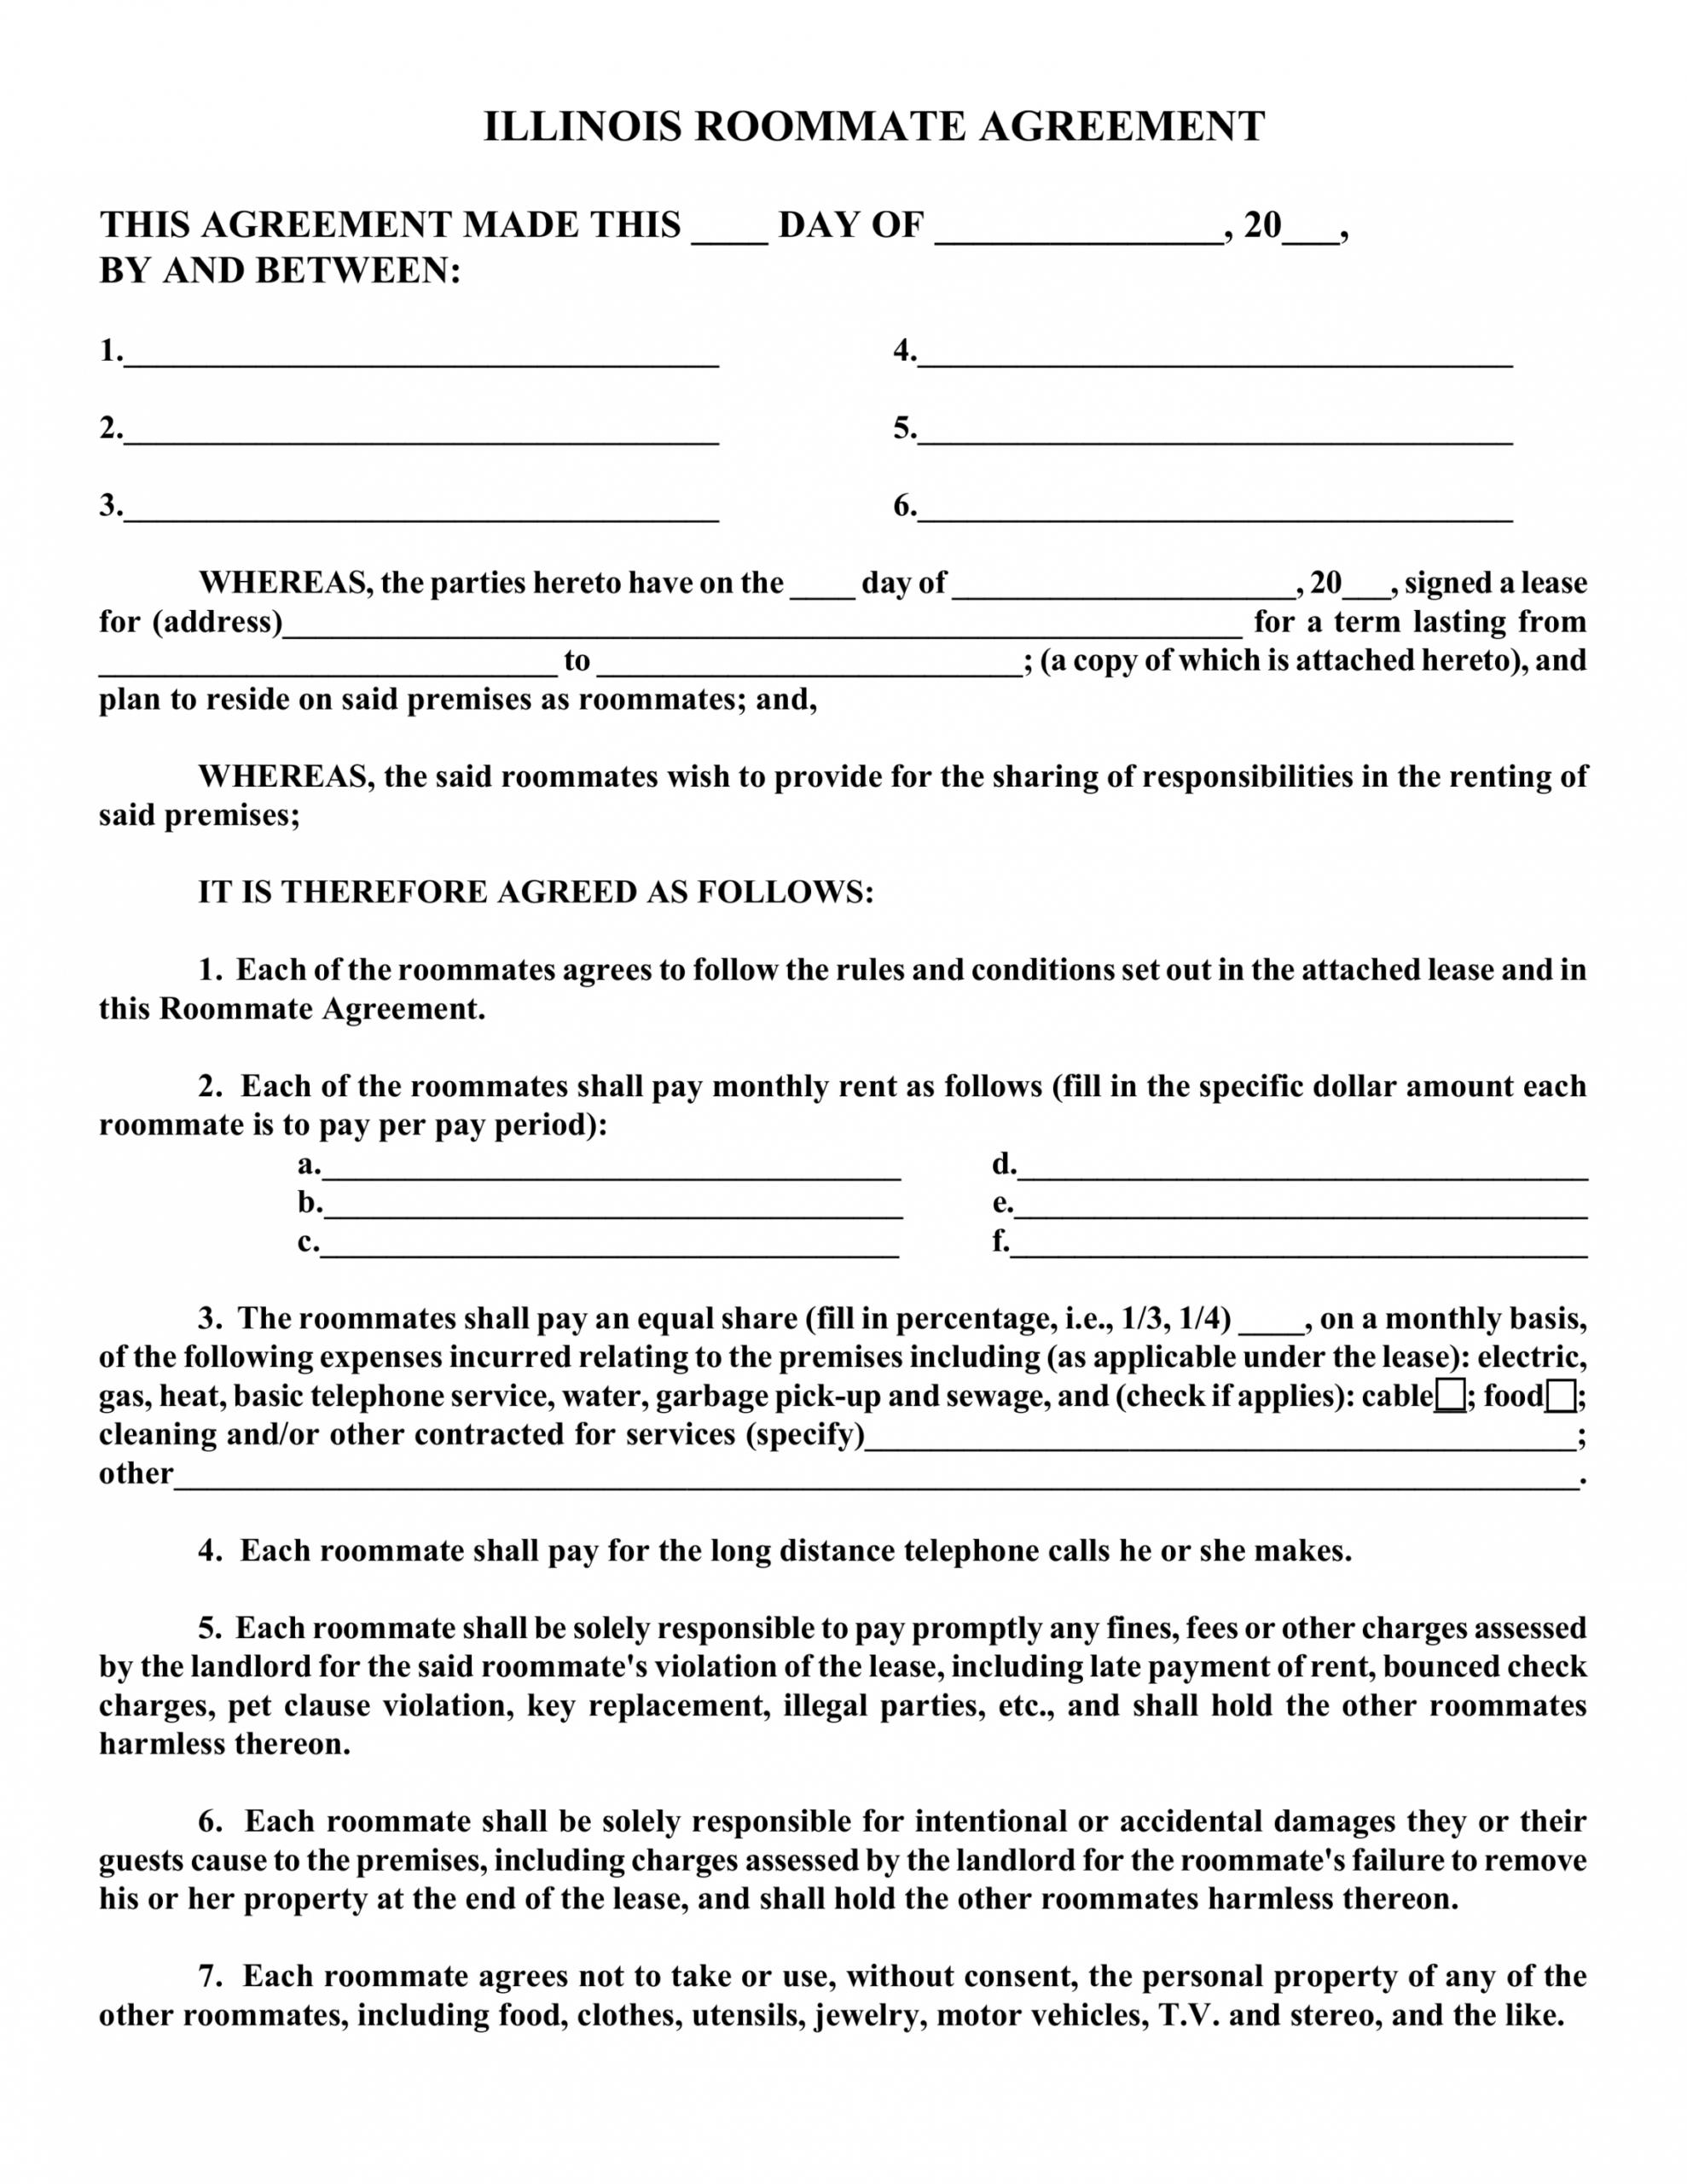 free free illinois roommate room rental agreement form  pdf room rental application form template example